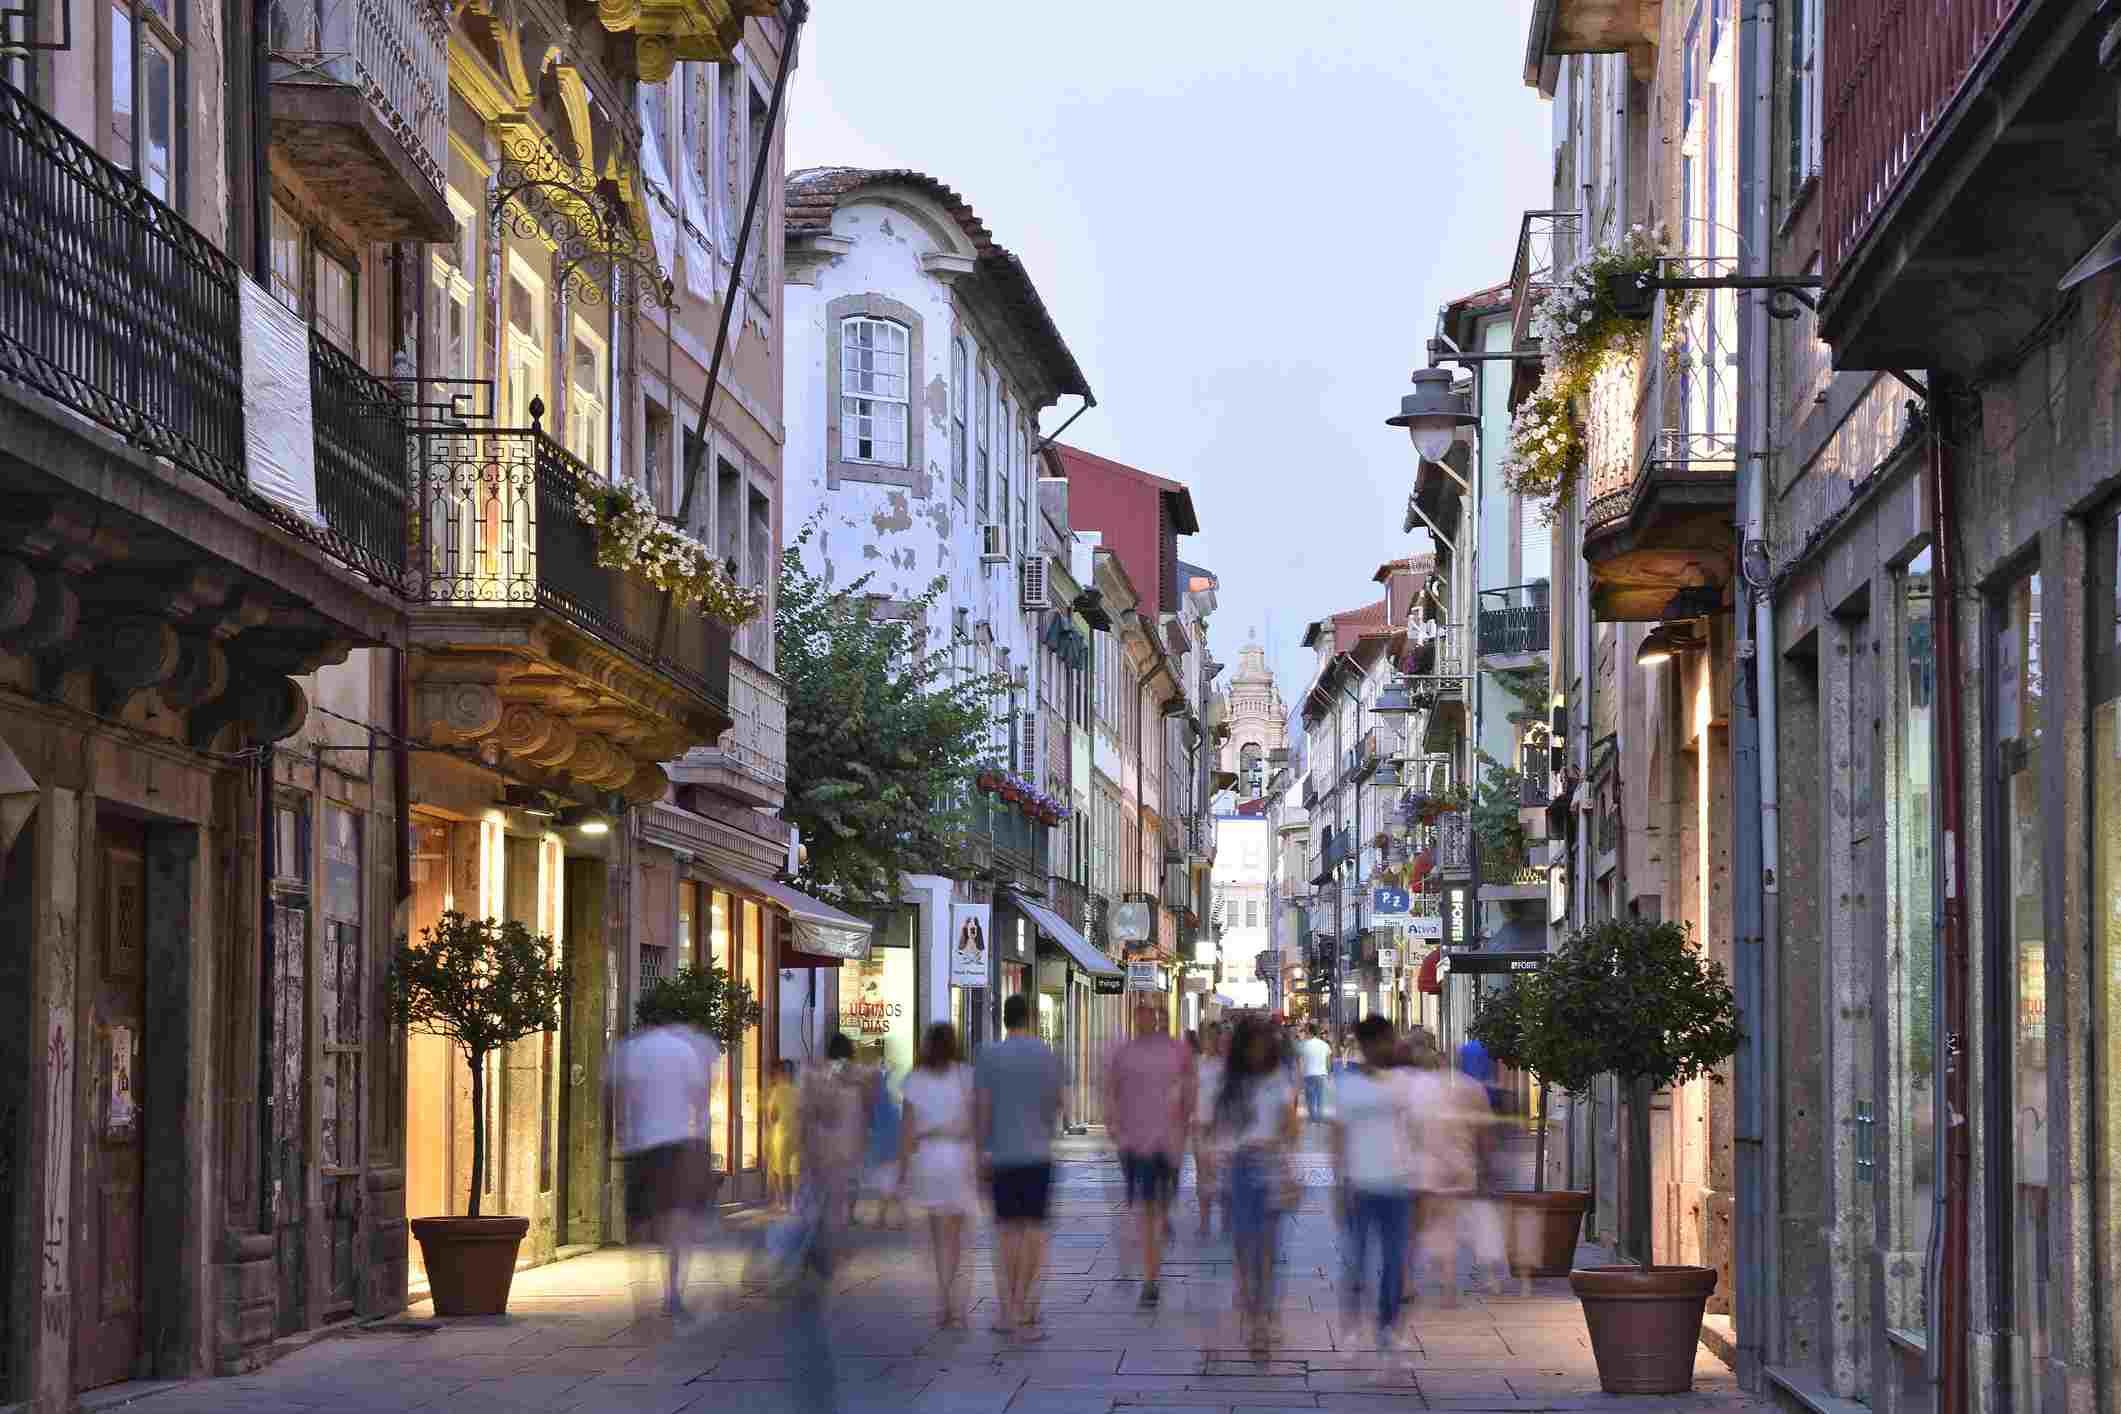 A street in Braga. Portugal